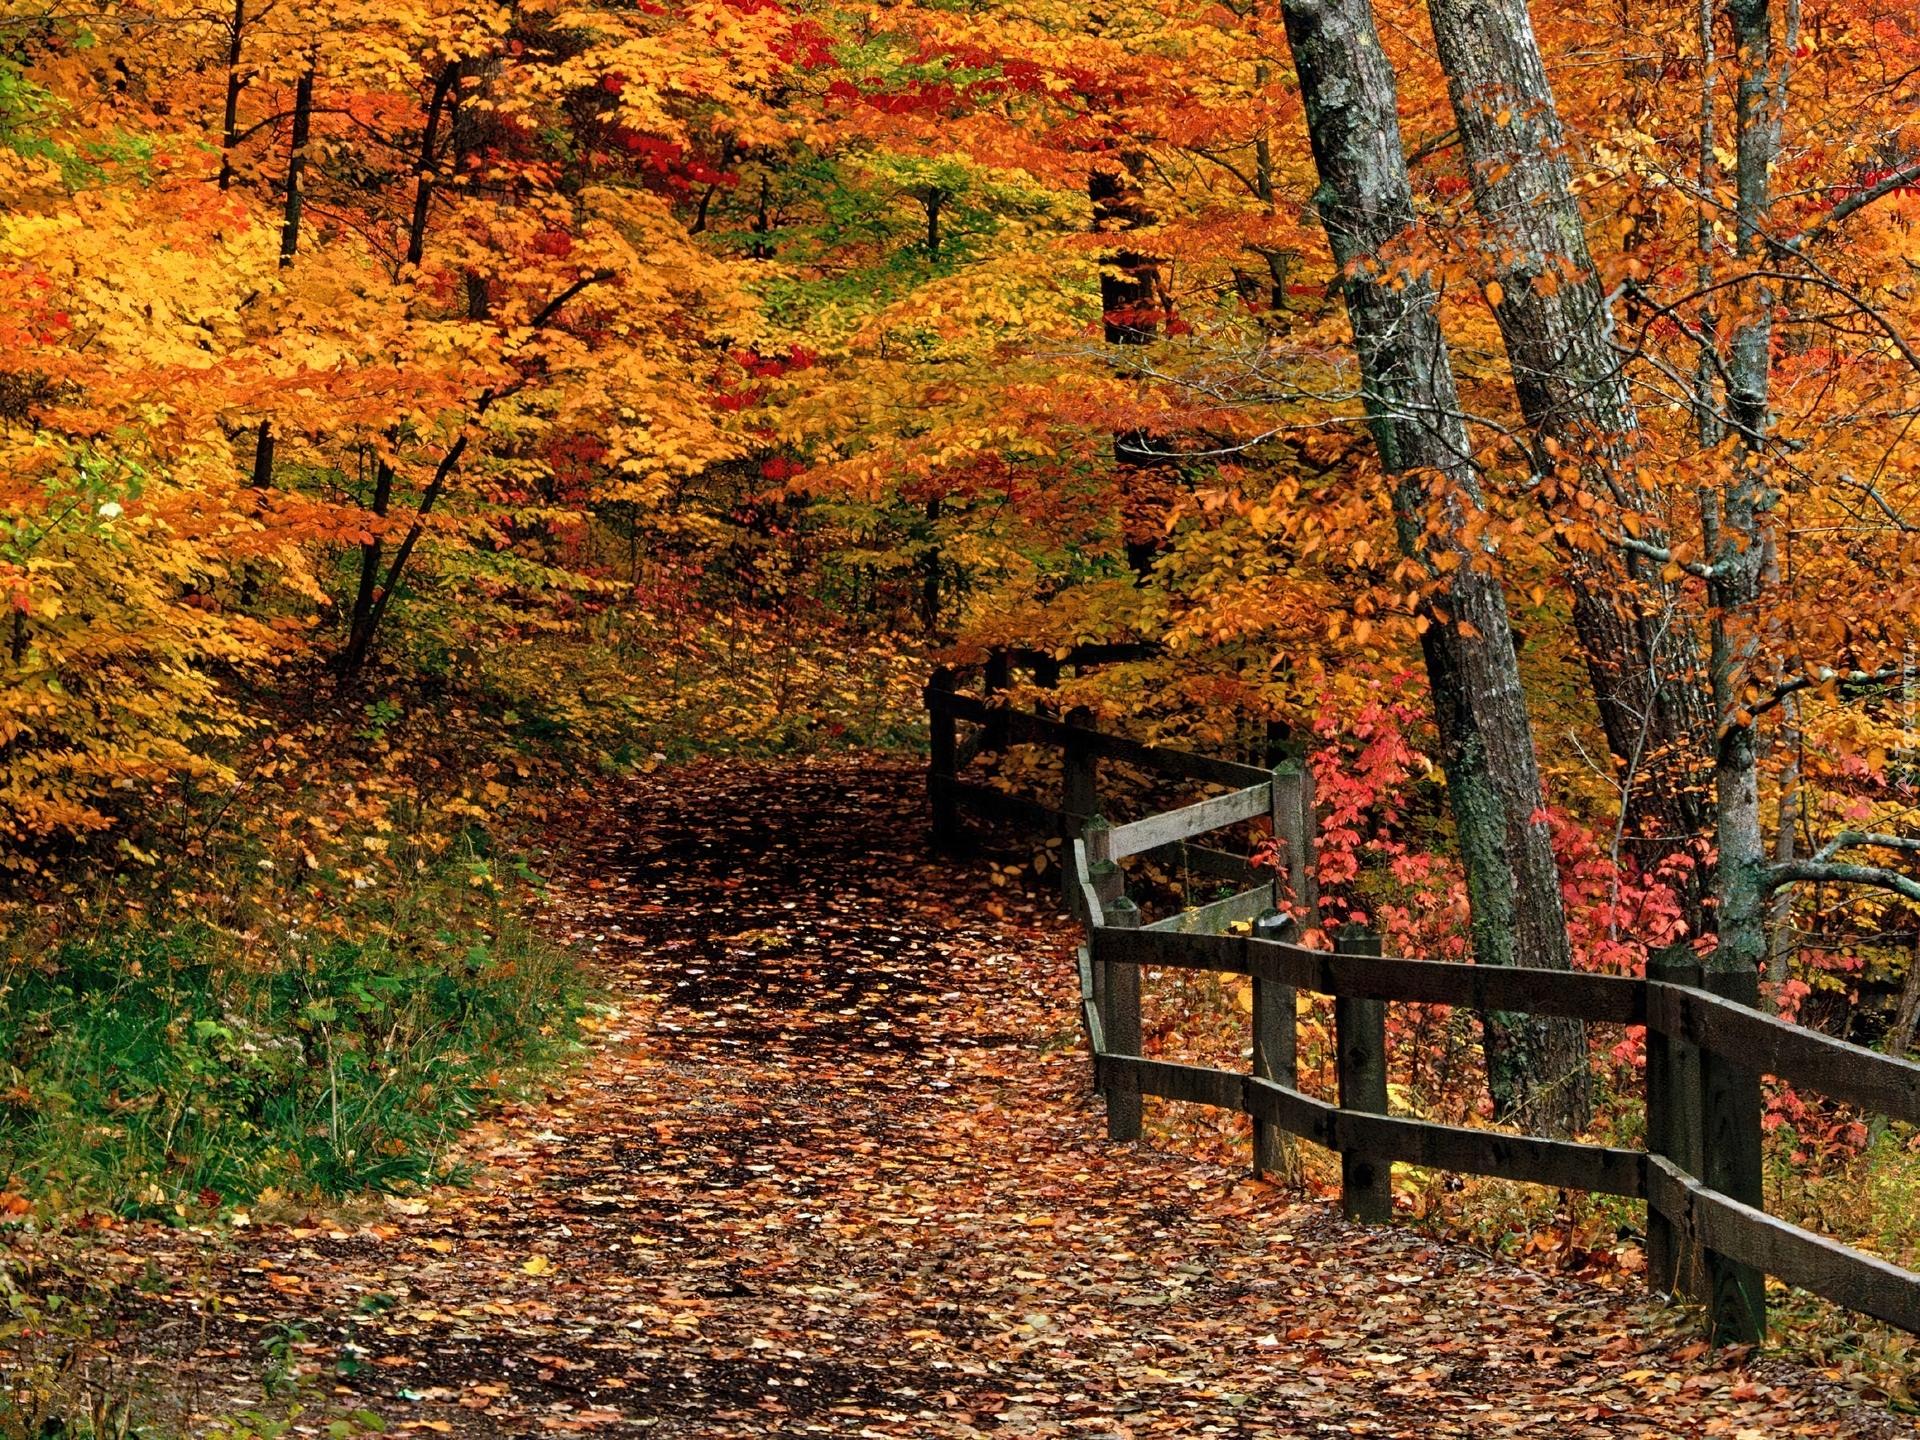 Las jesieni te pomara czowe li cie drzew for Immagini autunno hd